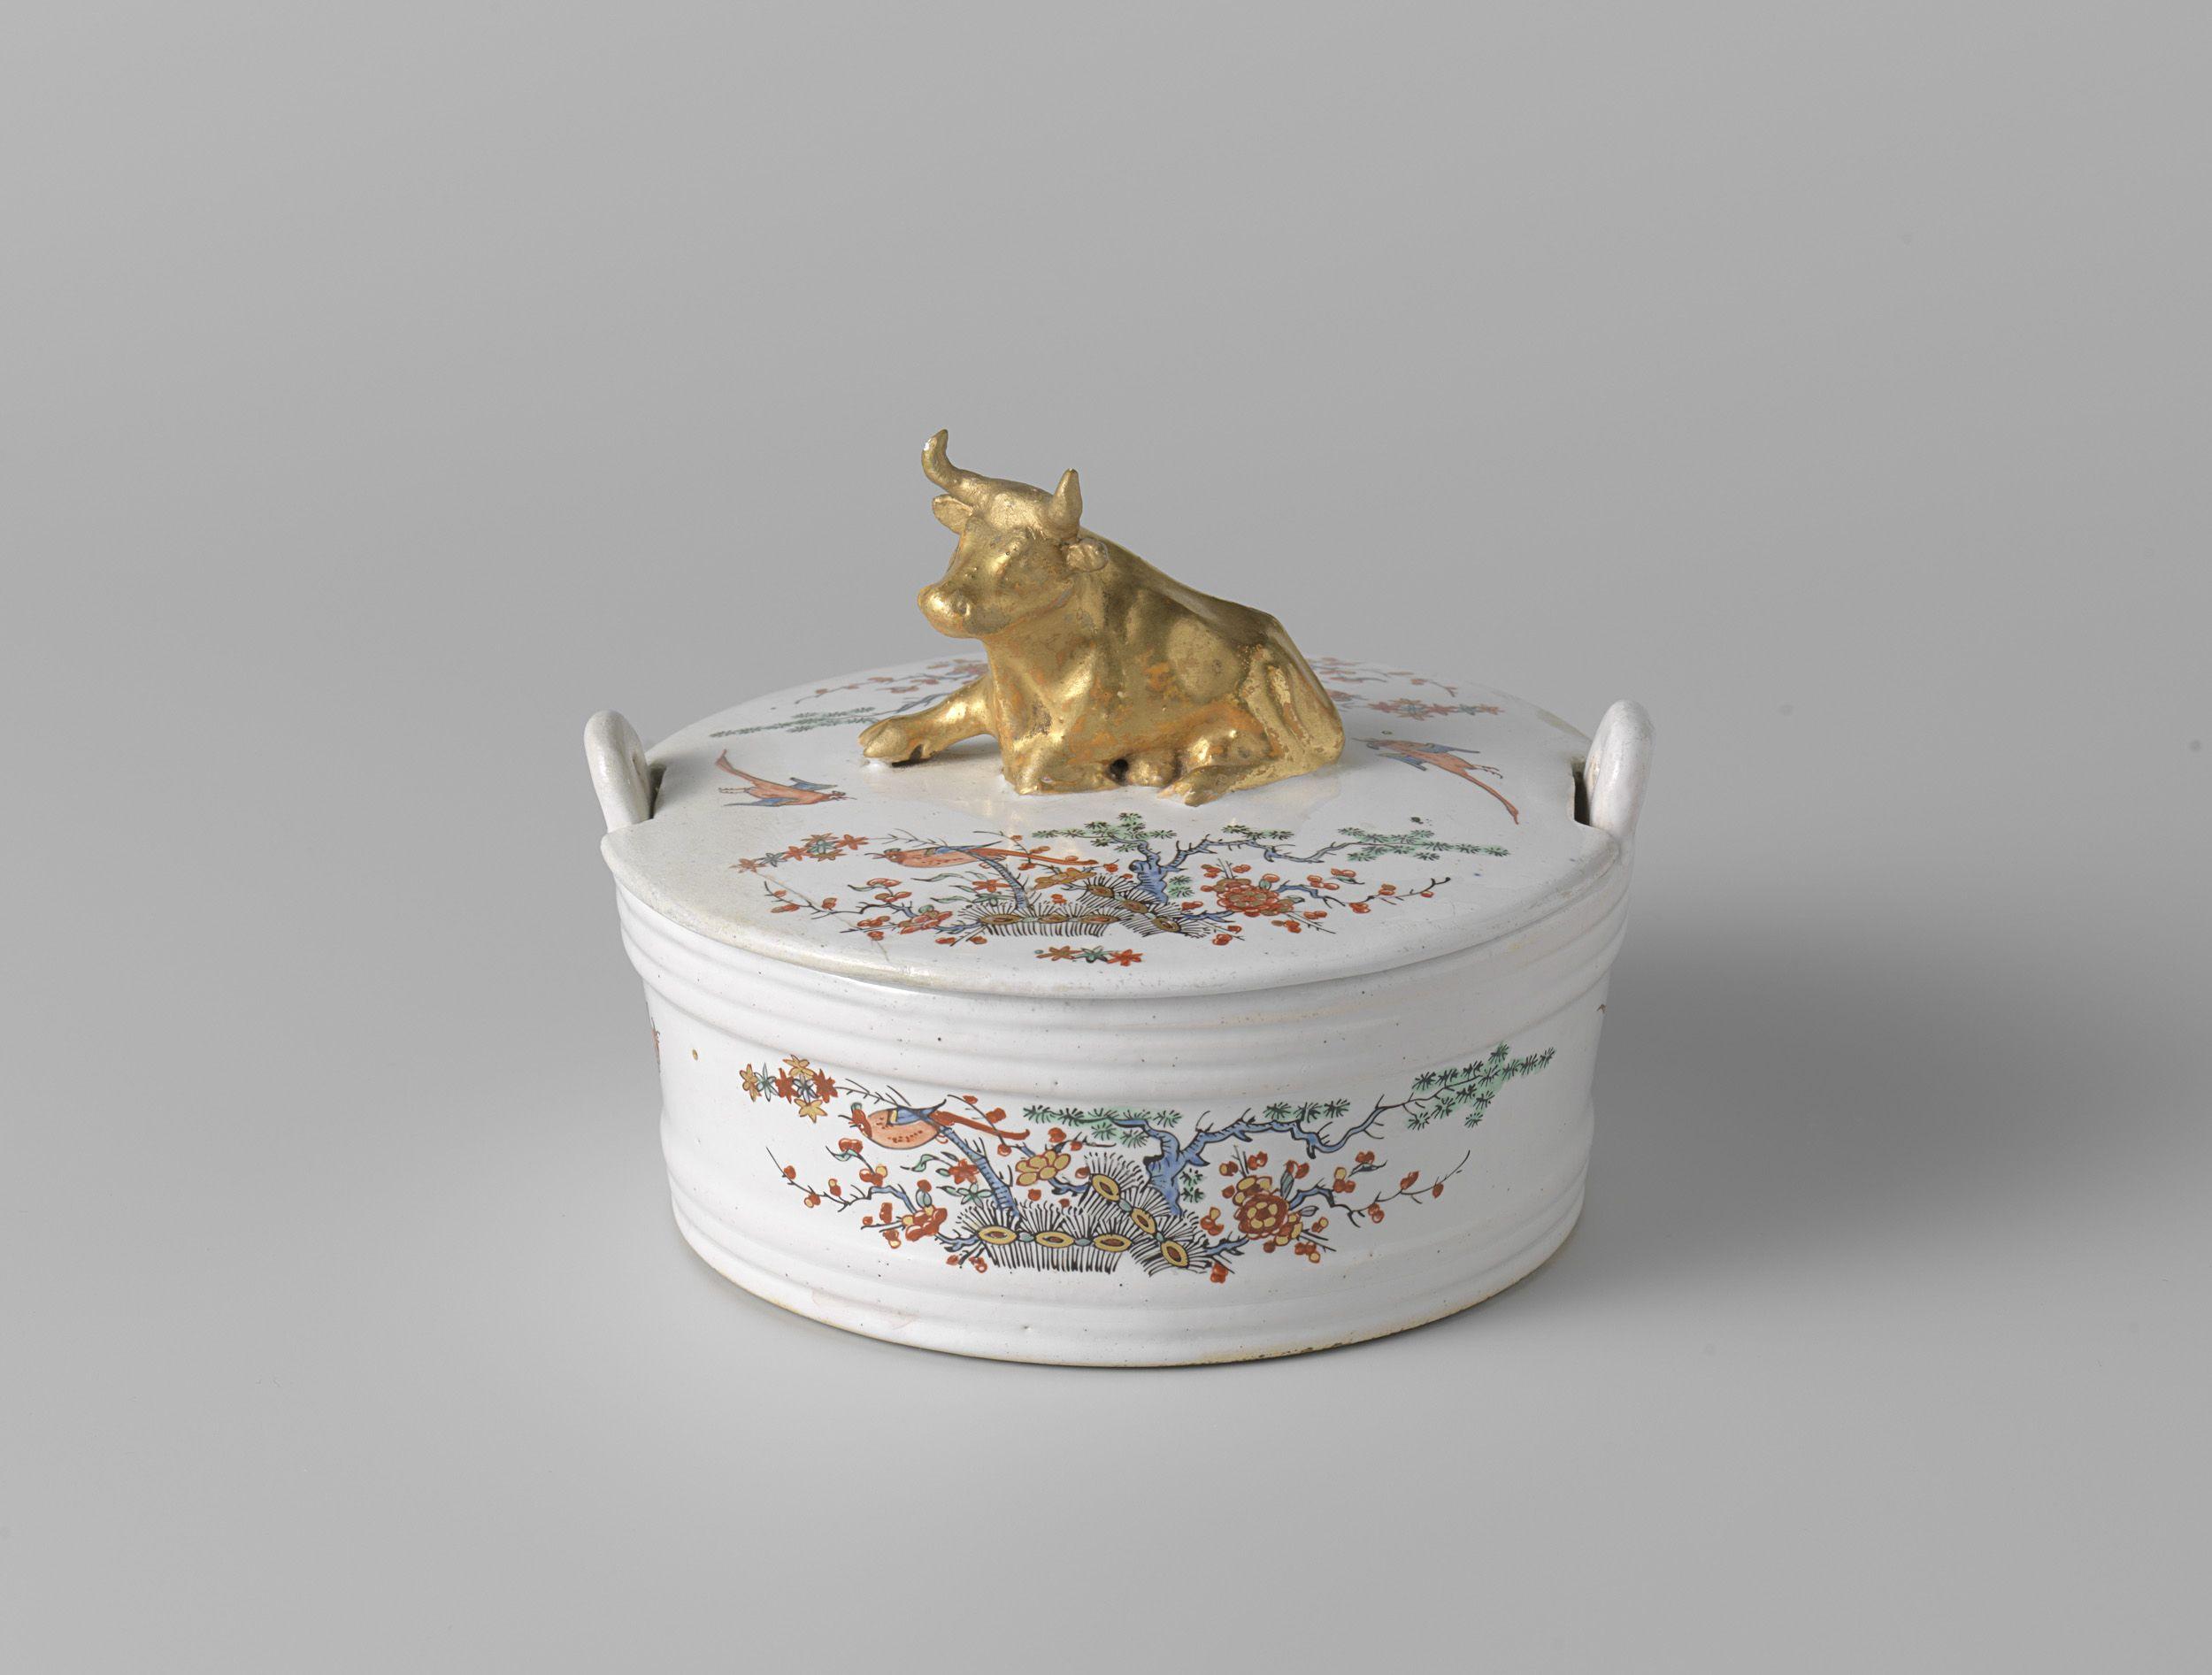 Polychrome Delft Kakiemon petit feu doré butter tureen with recumbent cow, 1730-1740. Rijksmuseum Amsterdam, The Netherlands. Jeroen PM Hartgers